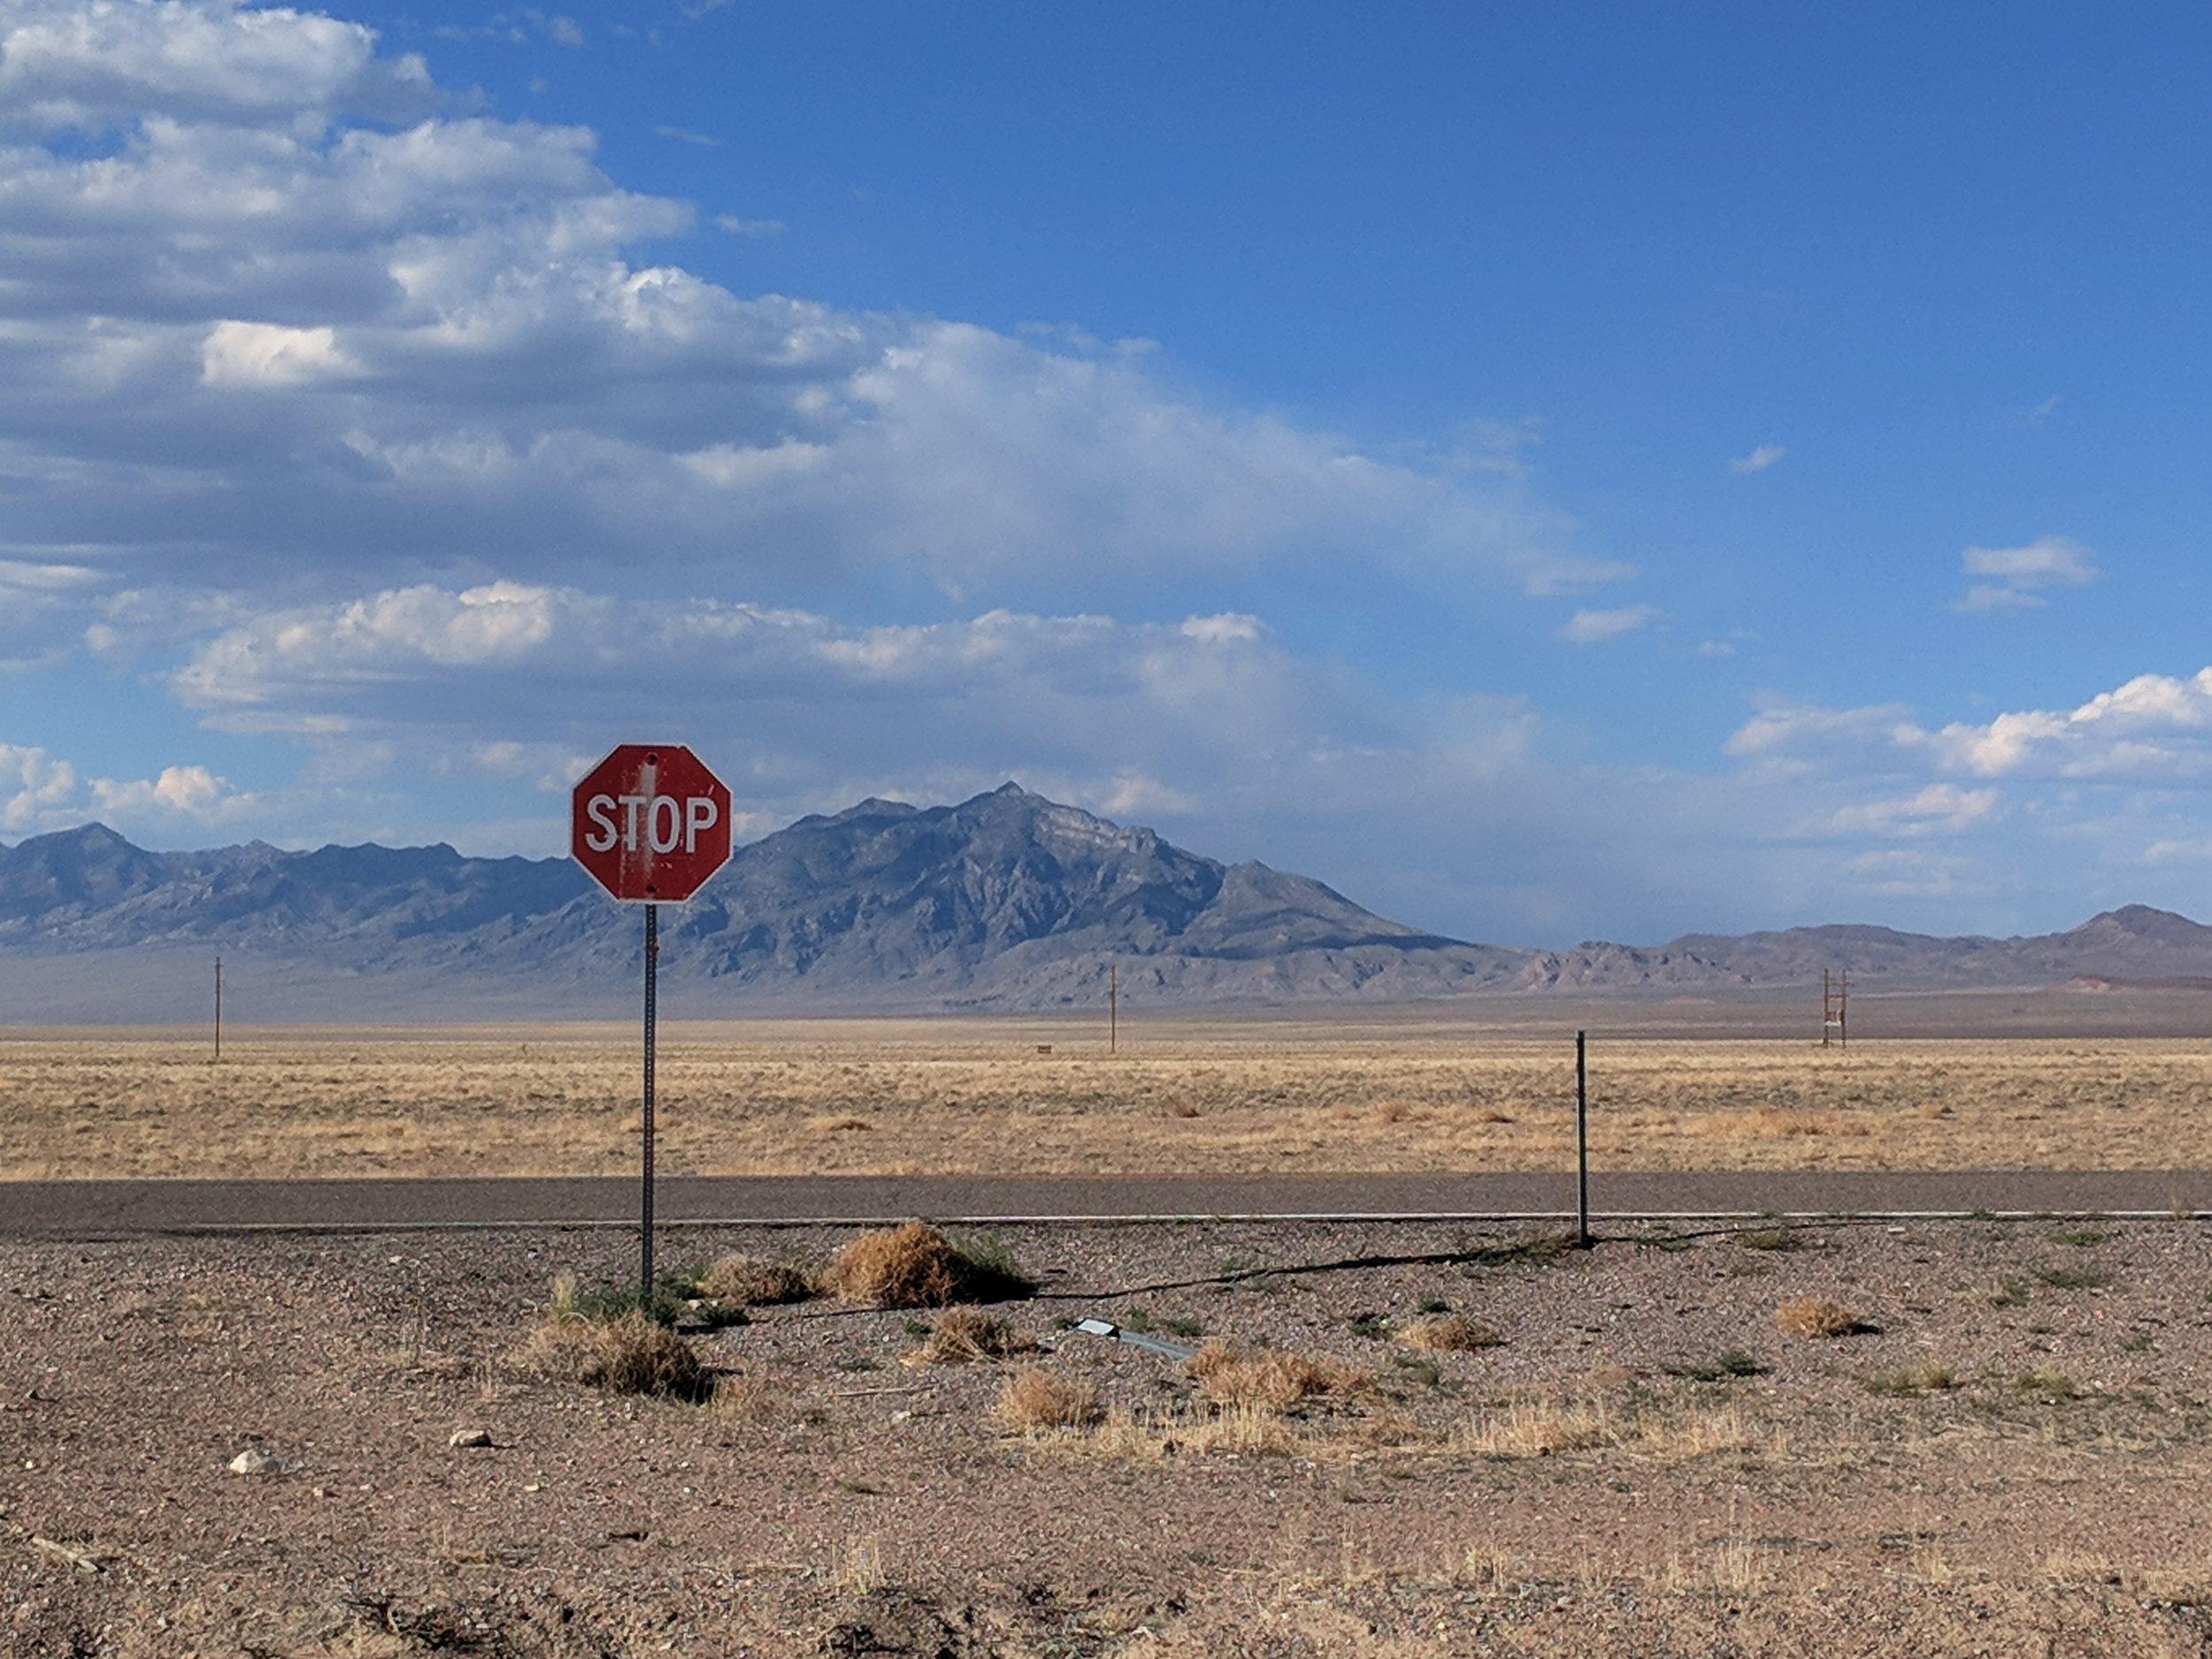 extraterrestrial+highway+state+route+nevada+375+alien+UFO2.jpg